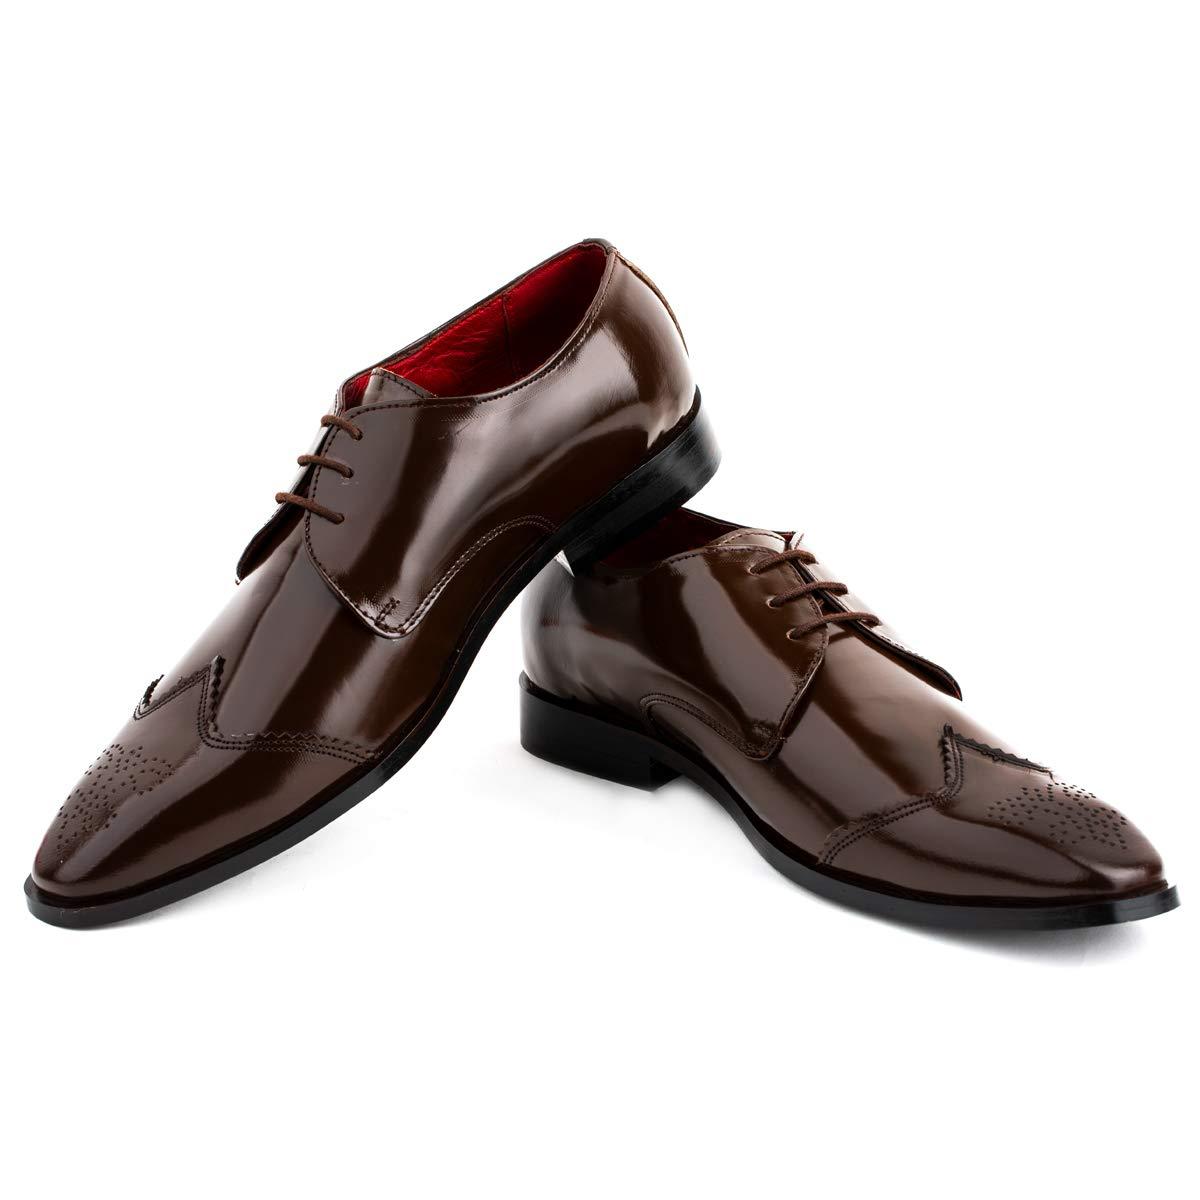 Buy LOUIS STITCH Luxury Leather Men's